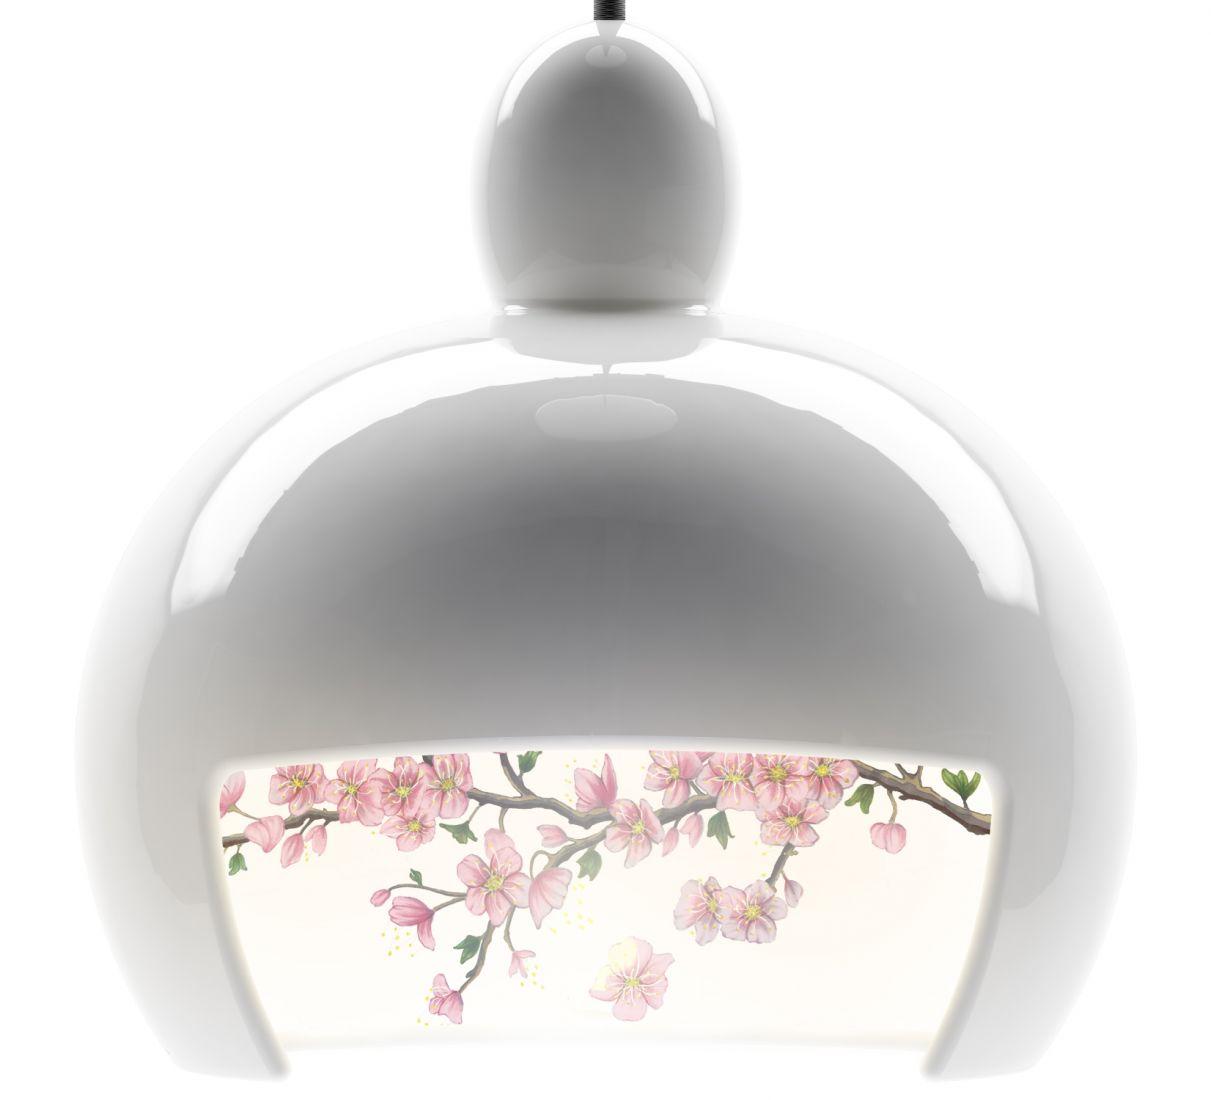 New Juuyo lamp from Moooi